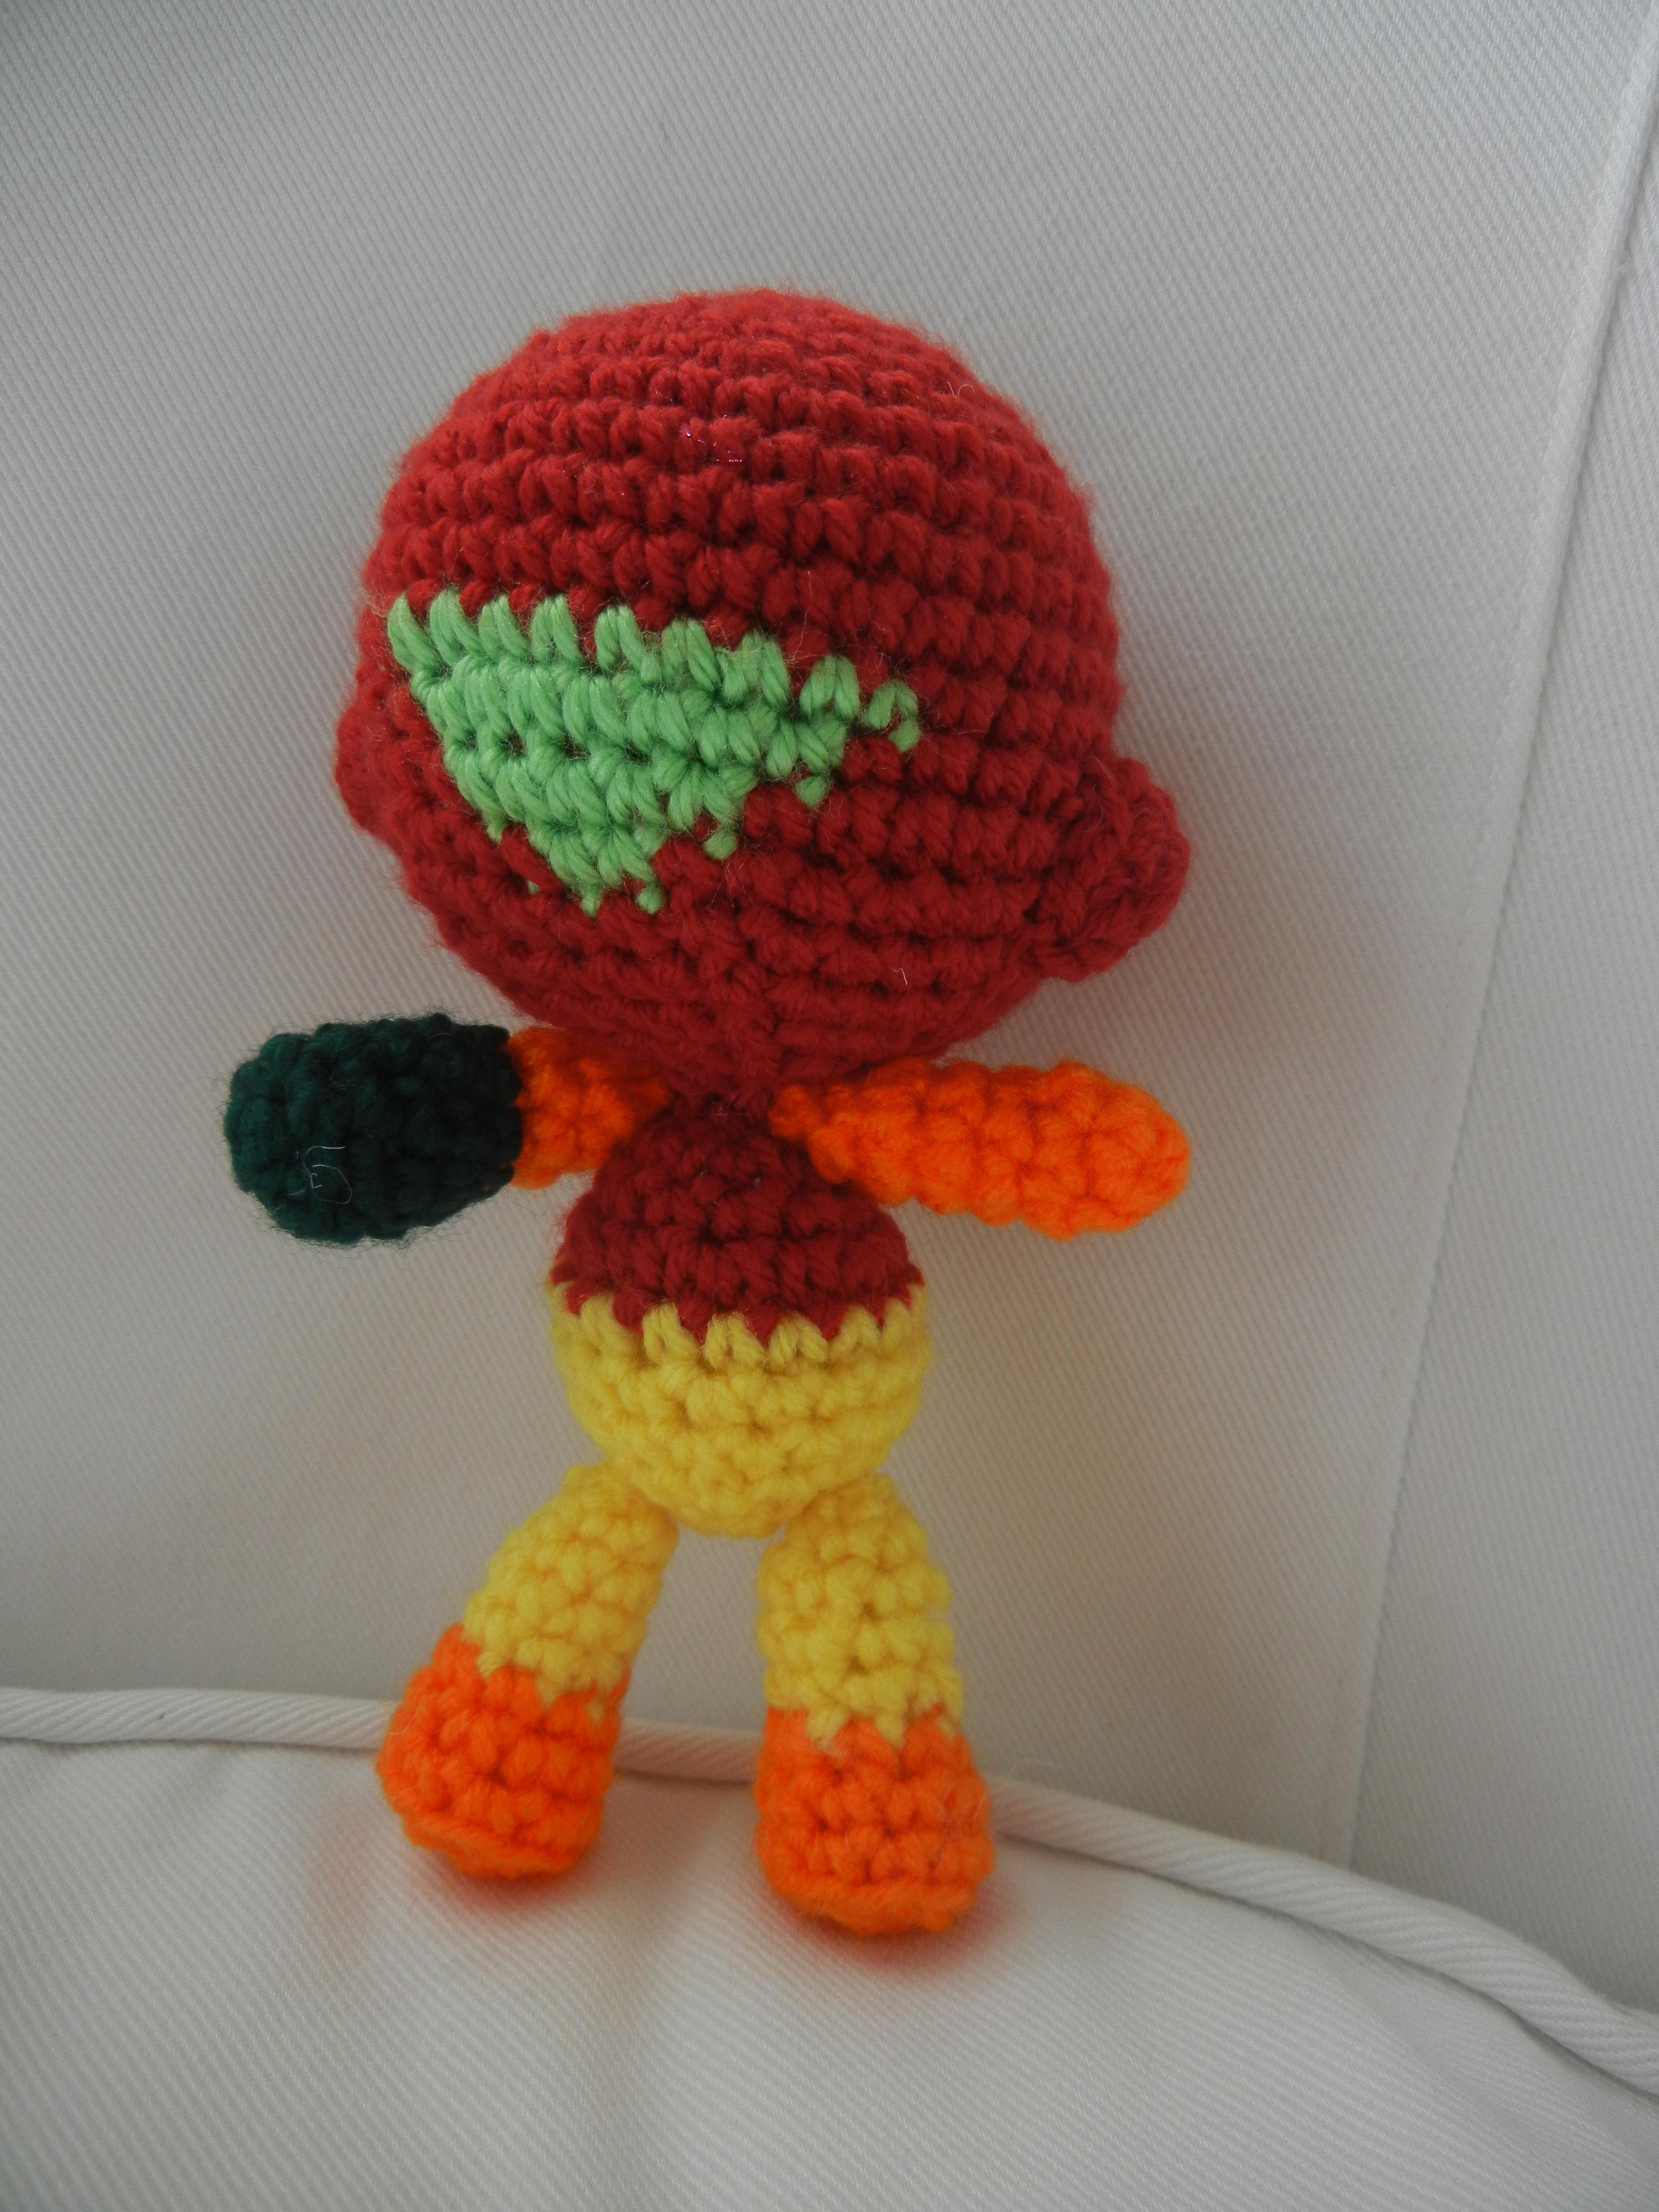 Picture of Samus Aran From the Nintendo Game Metroid